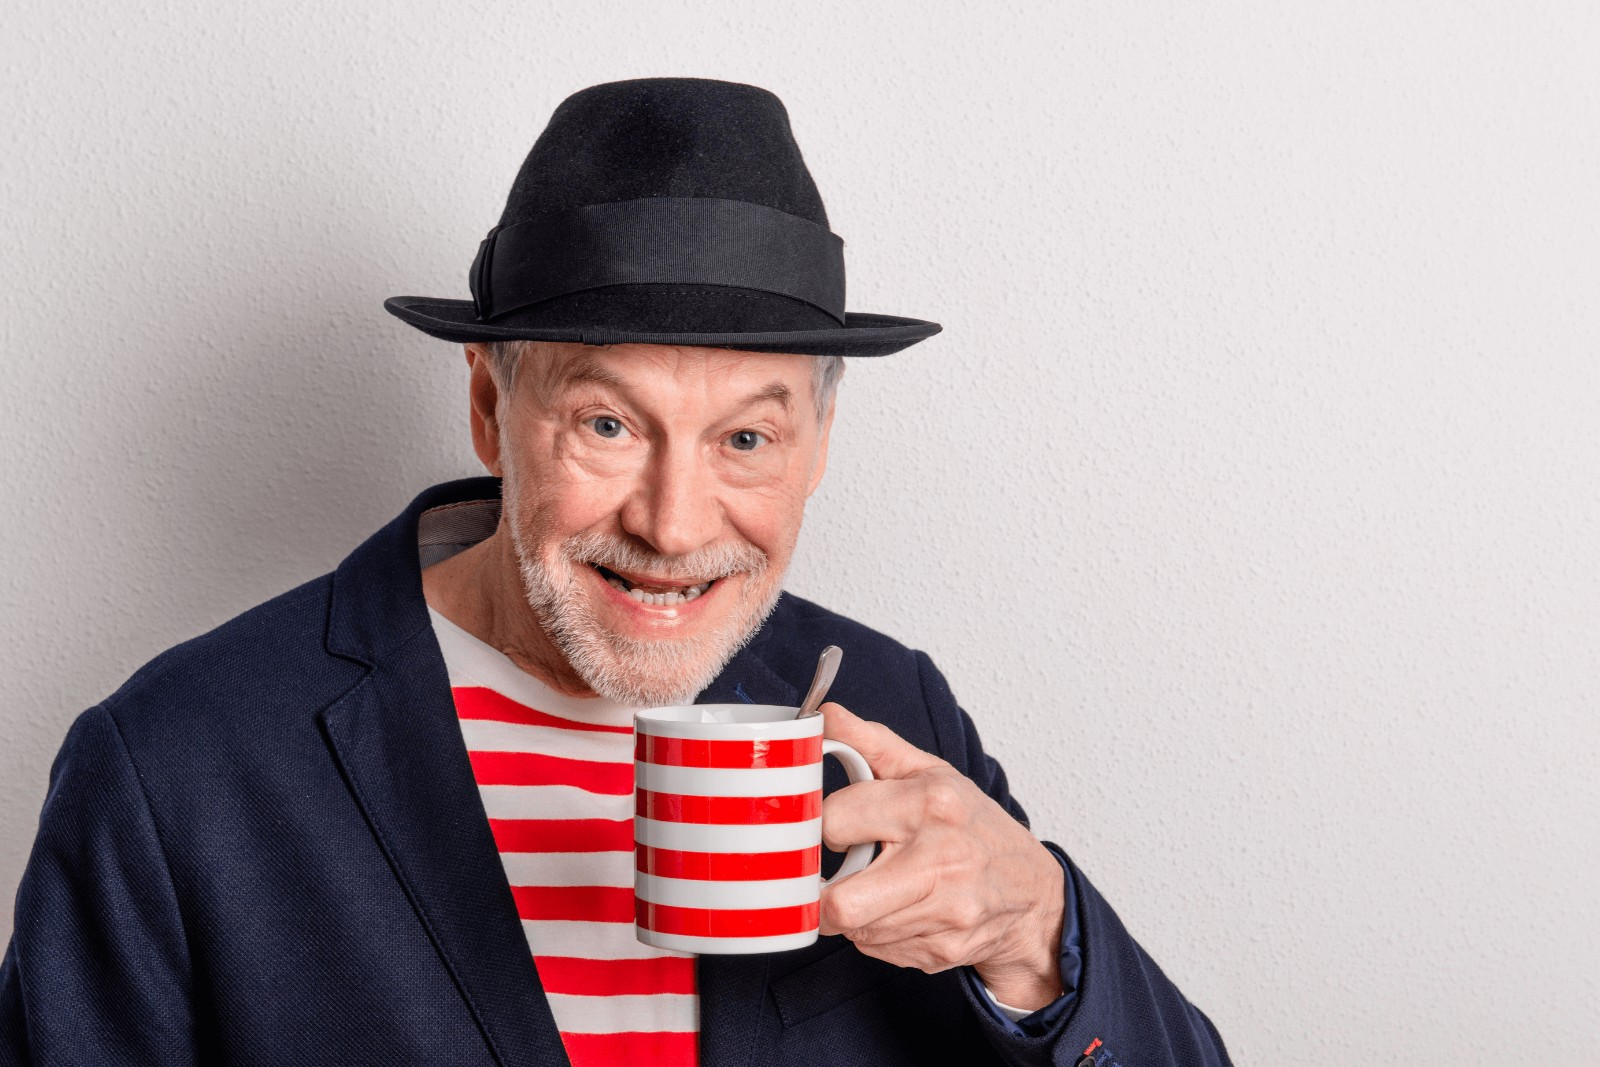 an old man wearing a striped shirt while holding a matching striped mug